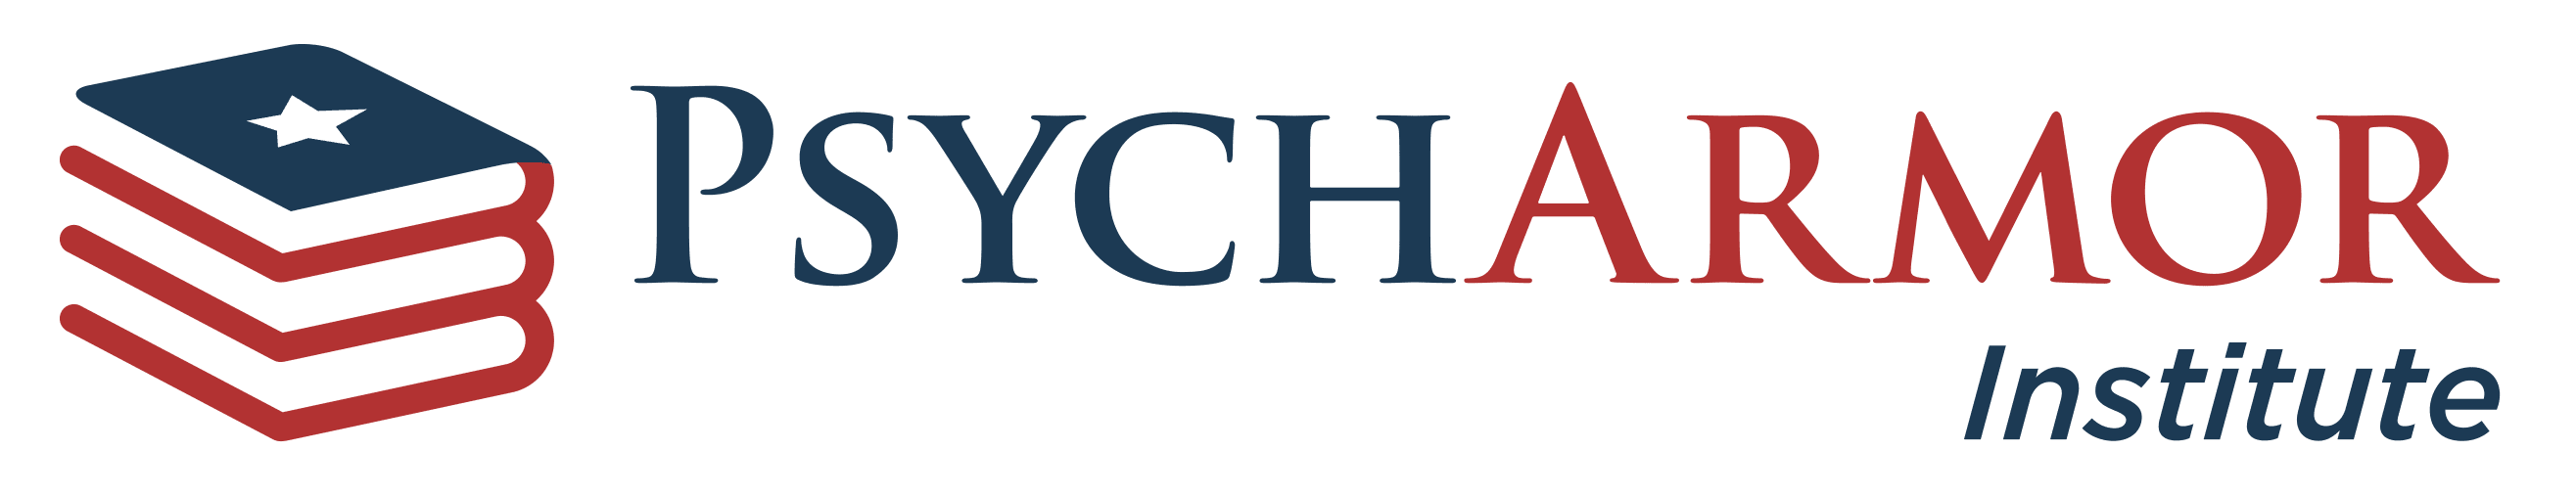 PsychArmor logo